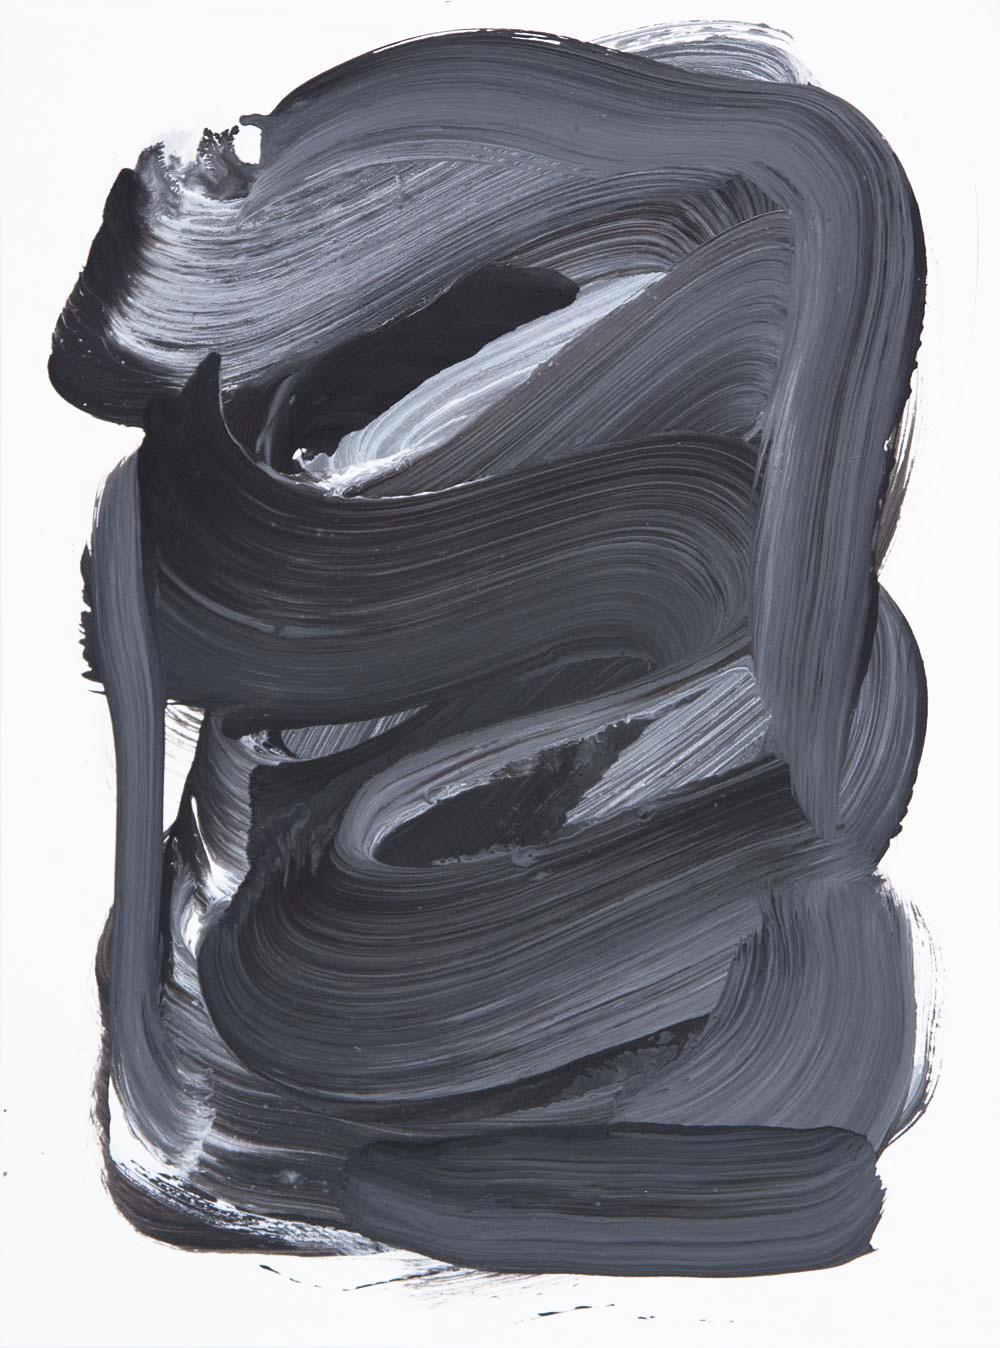 Wiseguy 3 , 2017 Acrylic 12 x 9 in.